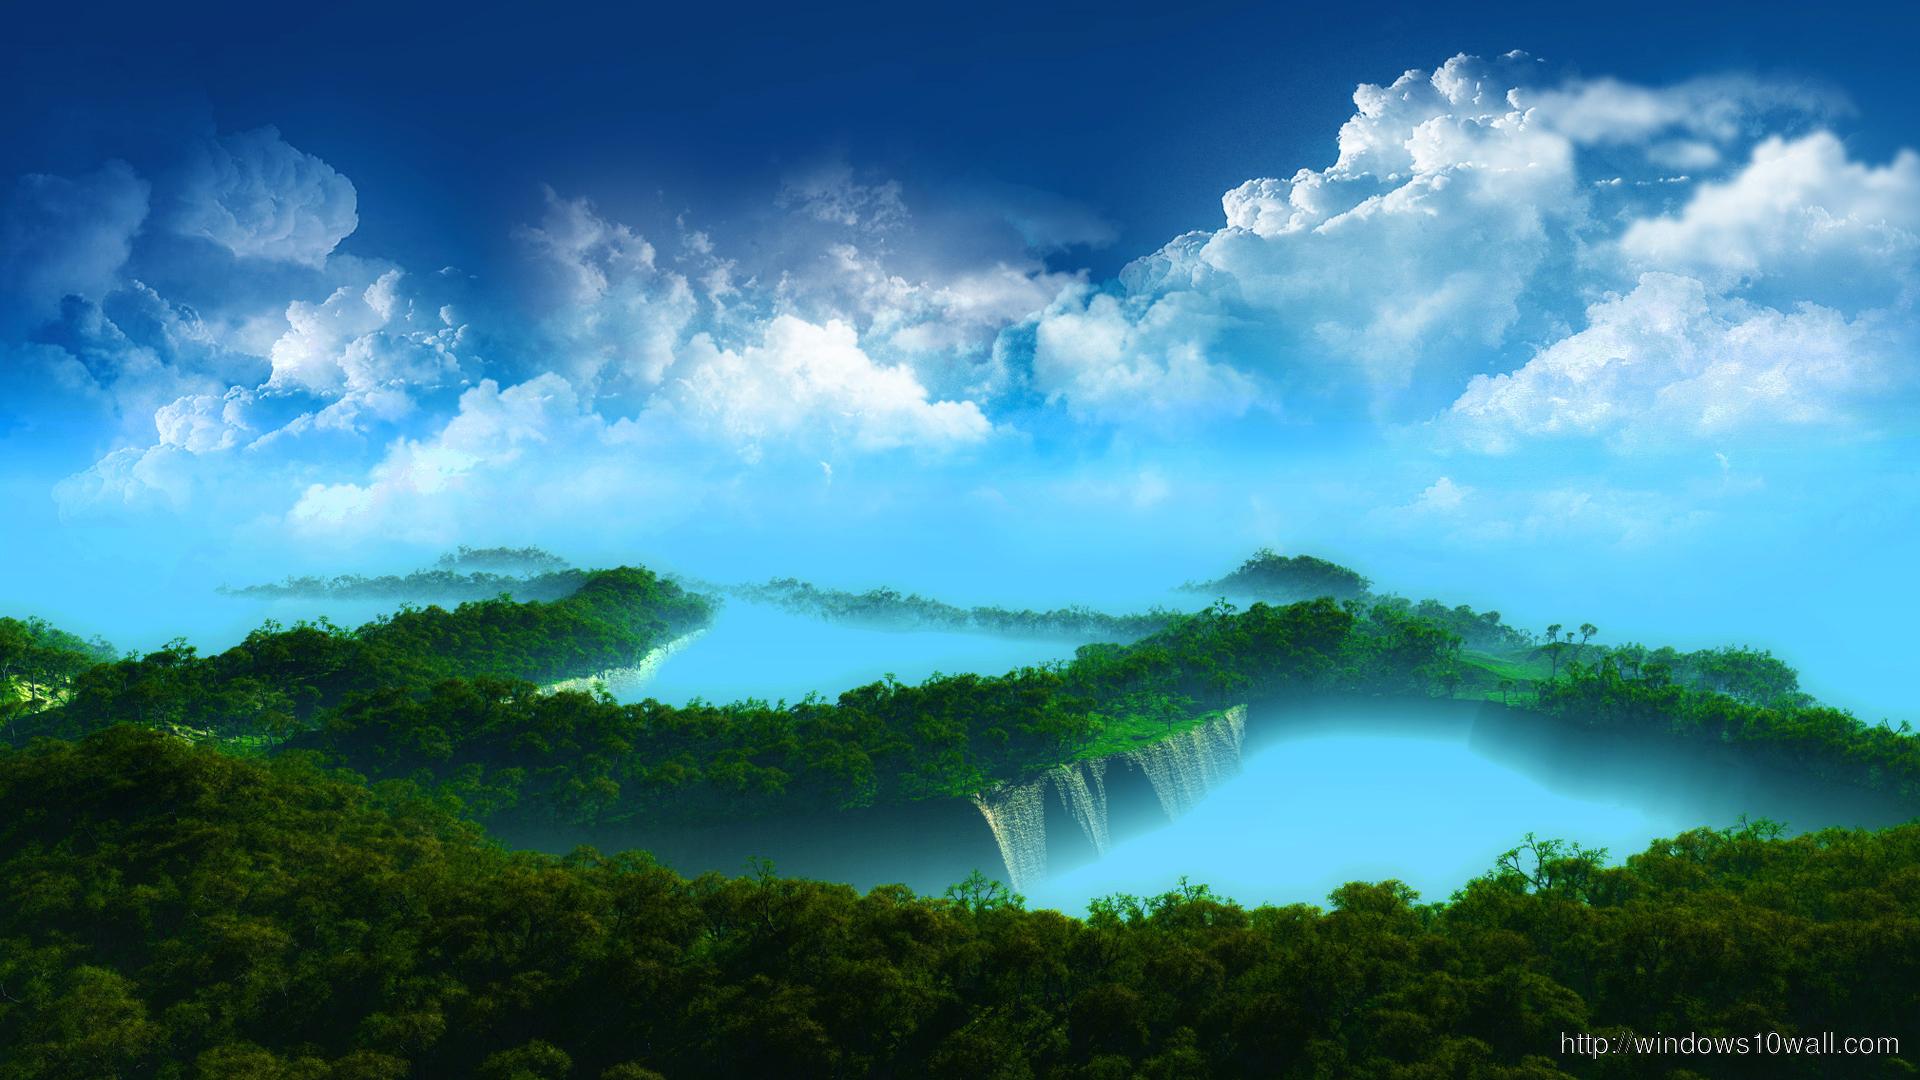 1080p wallpaper windows 10 wallpapersafari - Windows 8 1 wallpaper hd nature ...